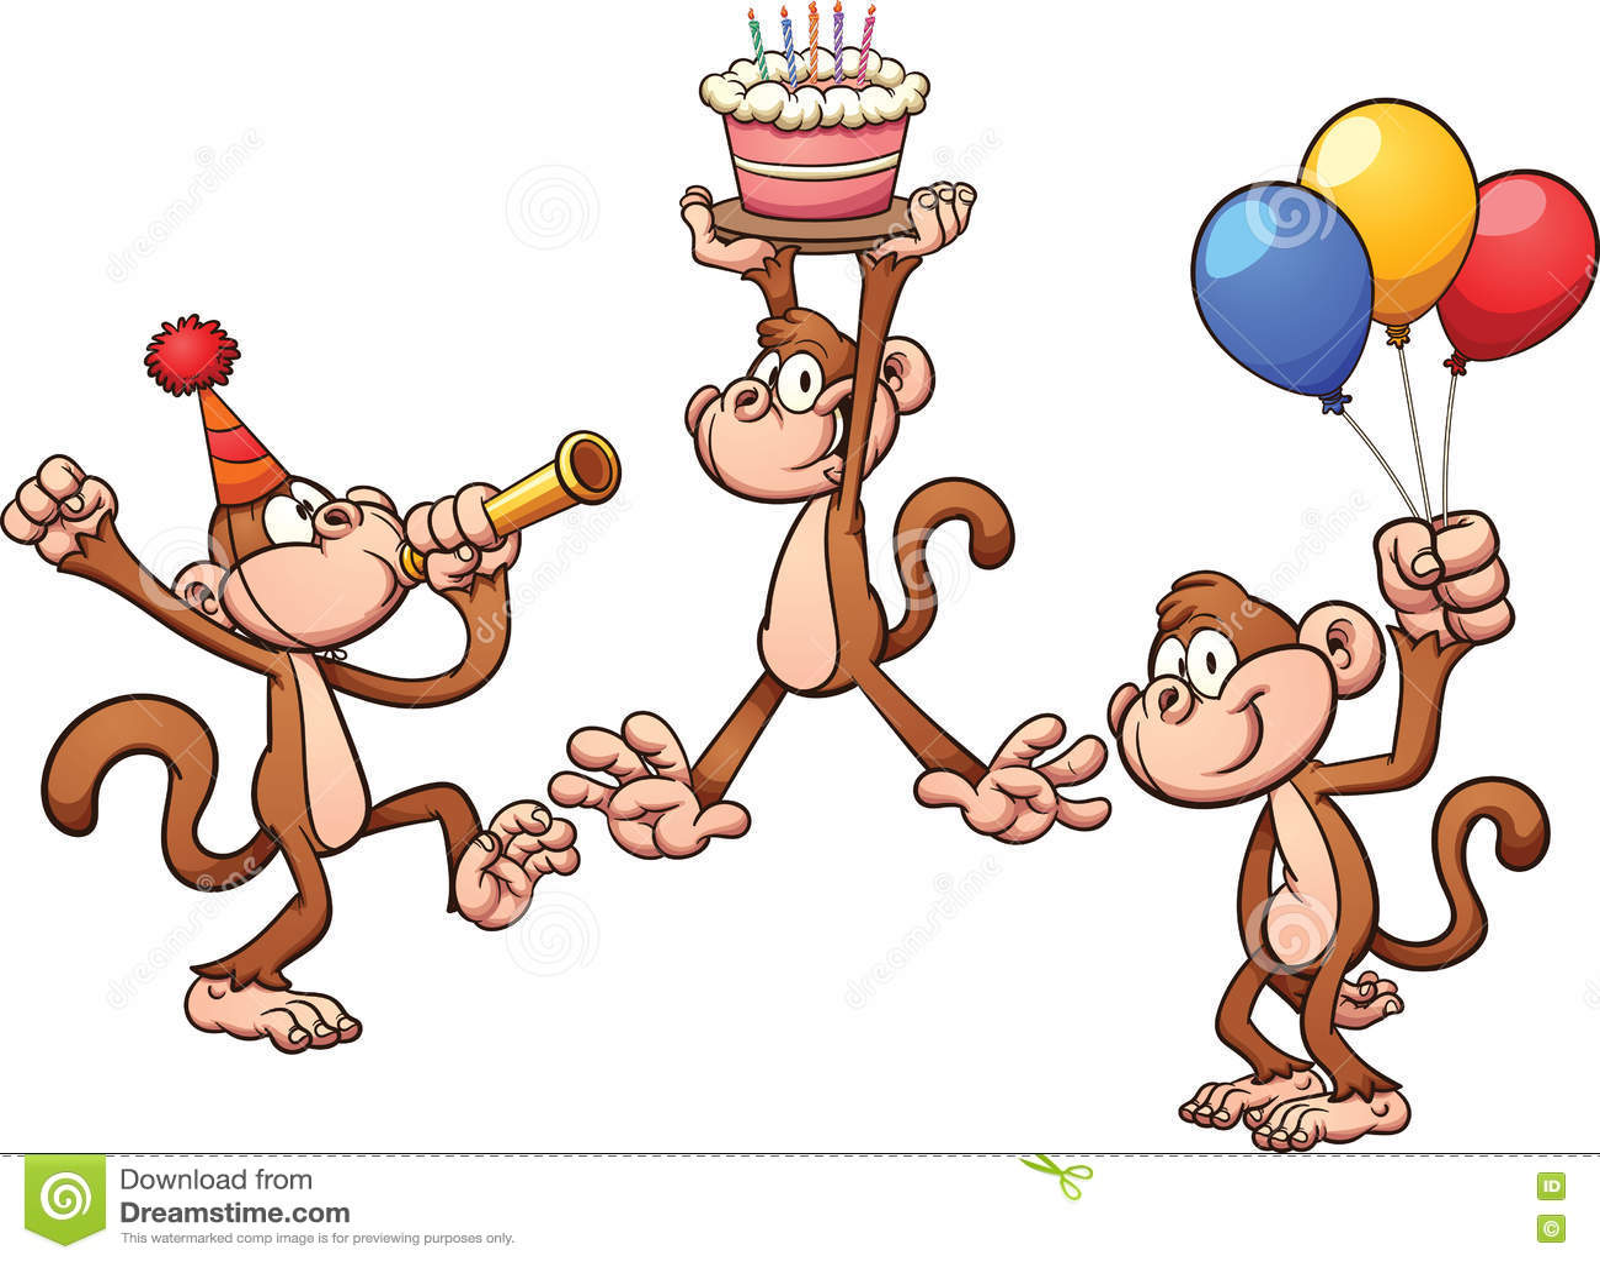 Поздравления от обезьян